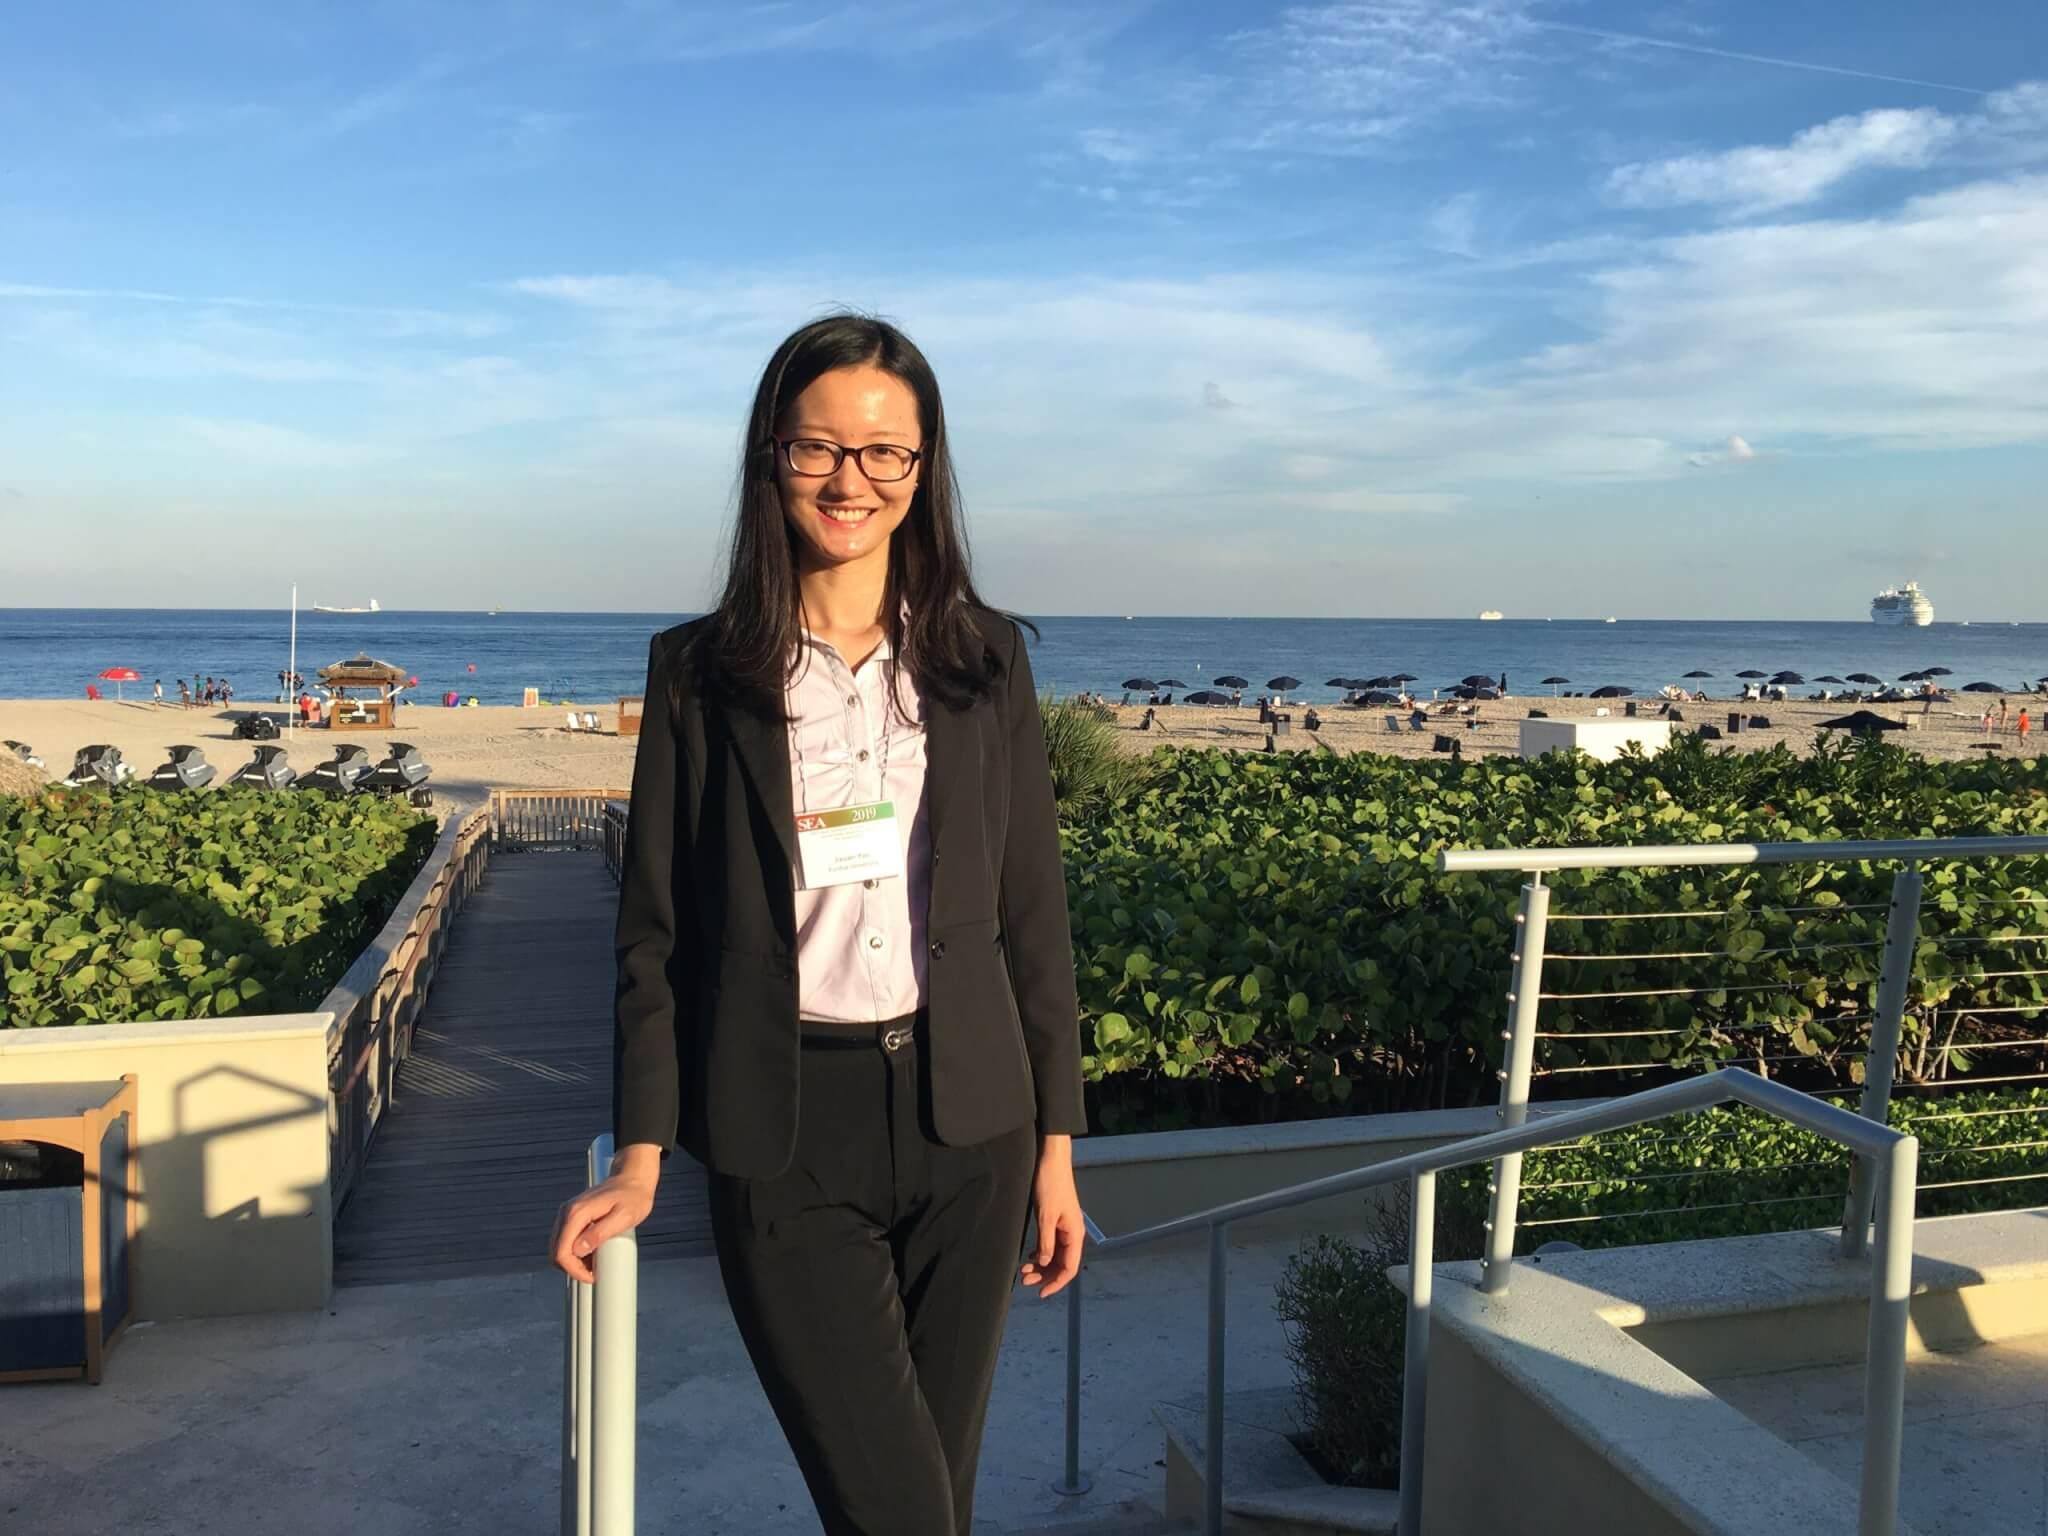 Yao by a beach